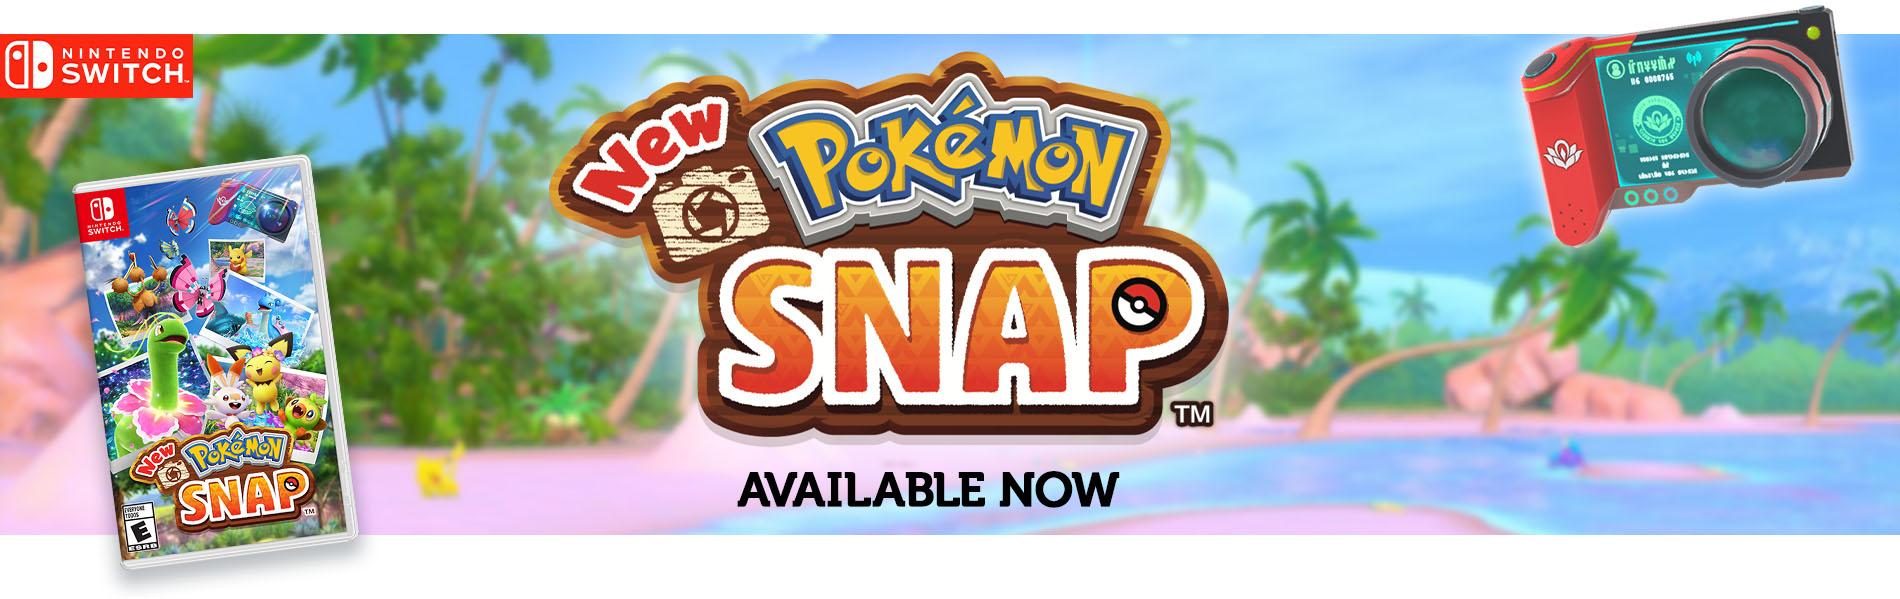 Nintendo Newpokemonsnap Launch 04.30.banner